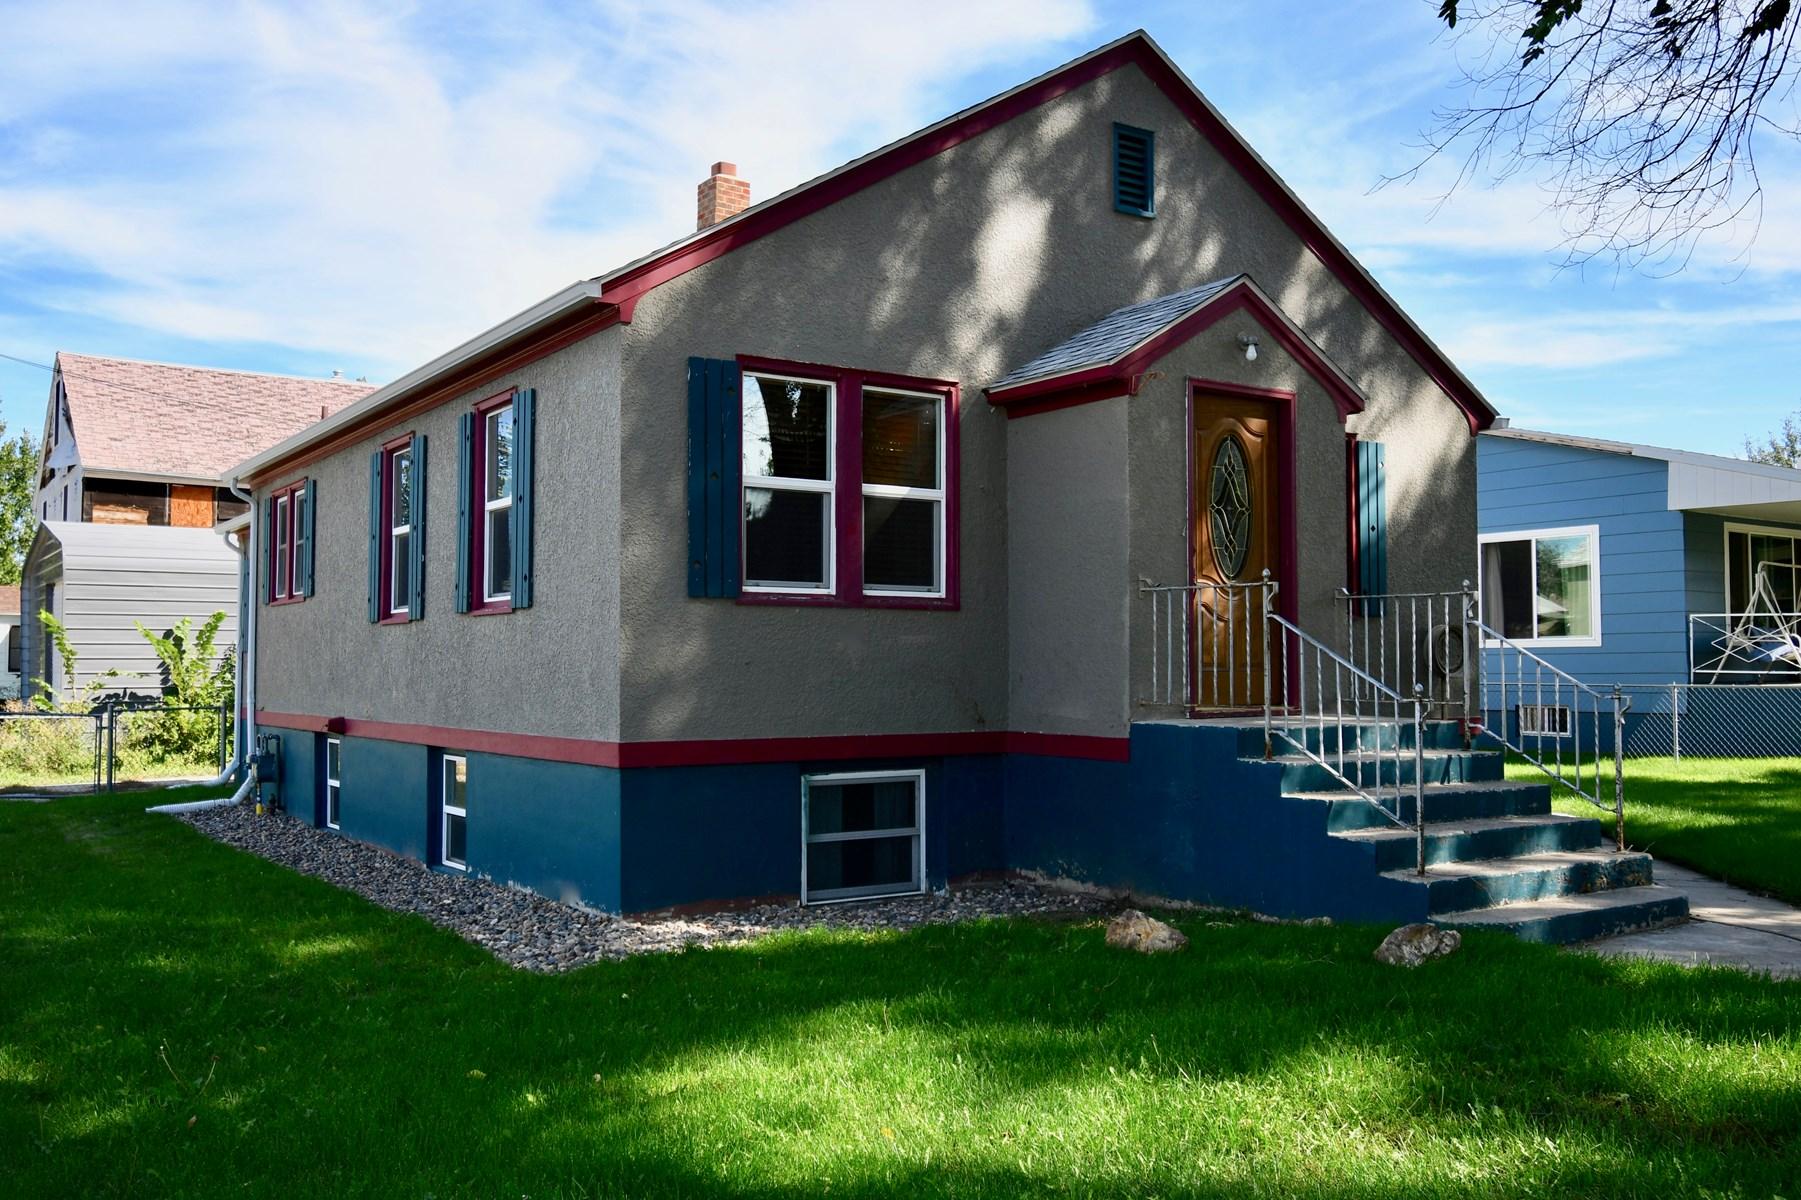 3 Bedroom, 2 Full Bath Home for Sale in Glendive, MT